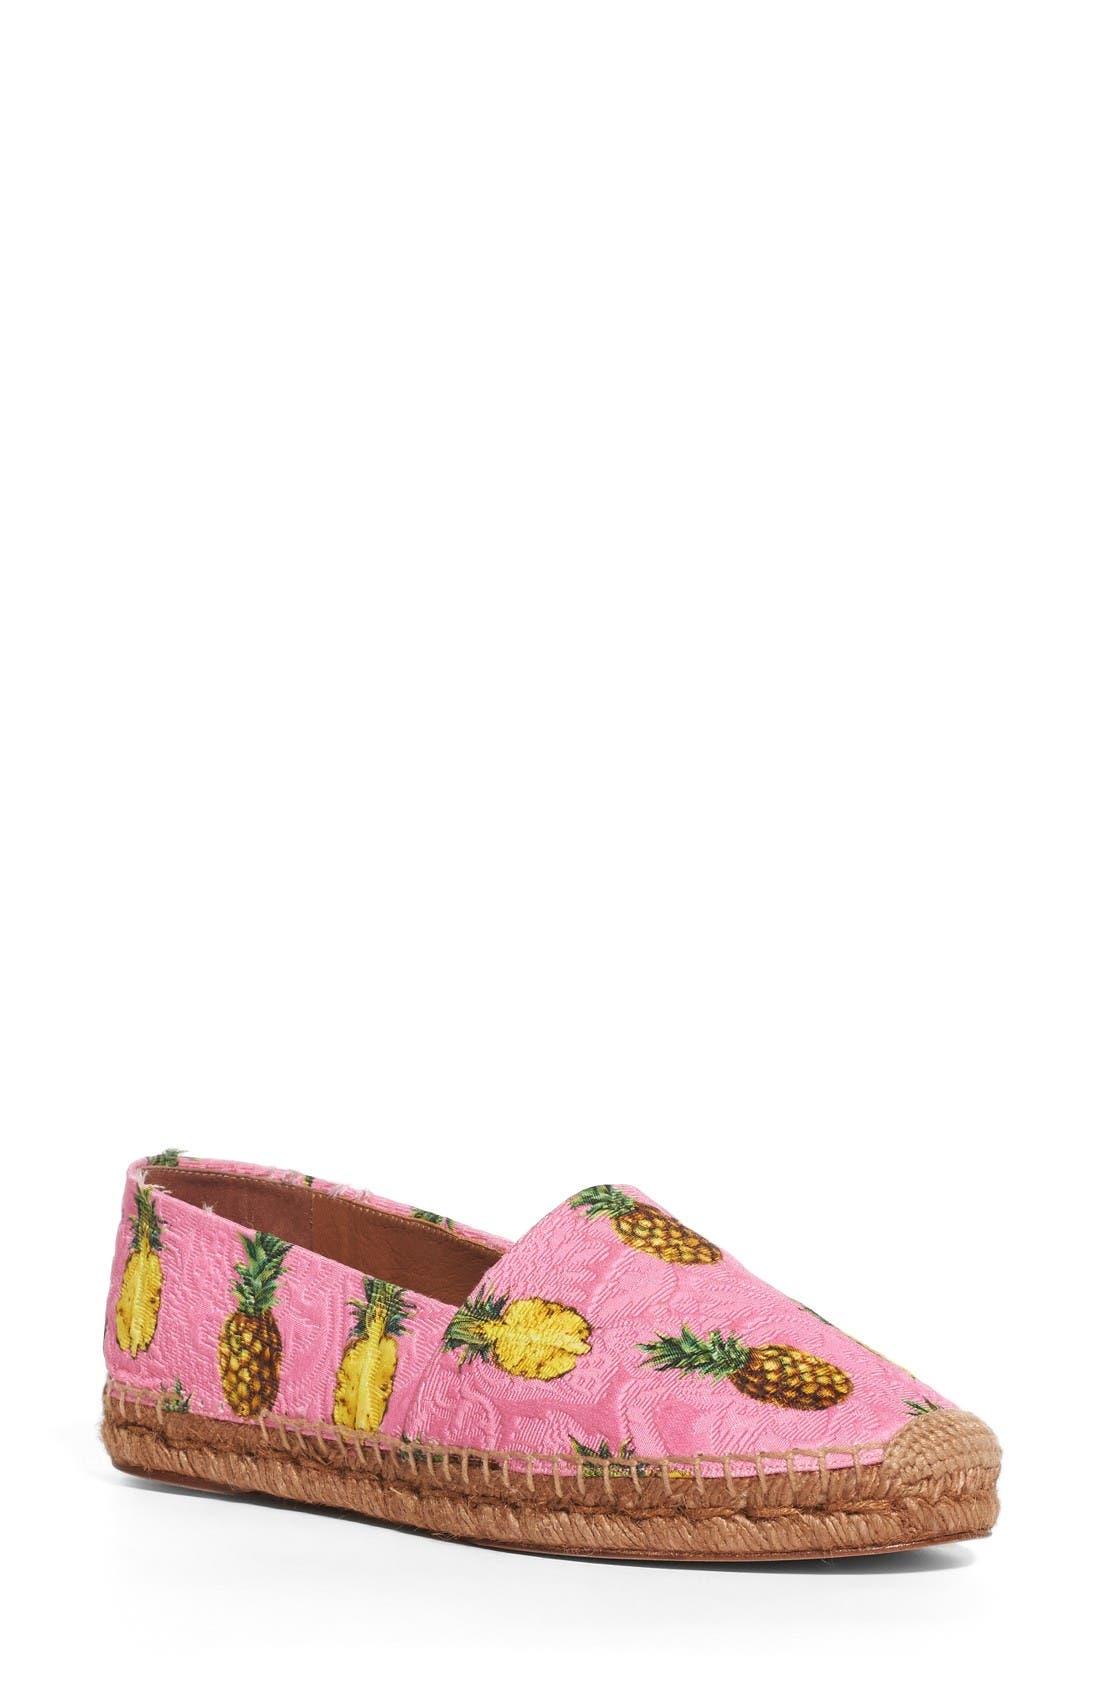 Main Image - Dolce&Gabbana Pineapple Print Espadrille Flat (Women)